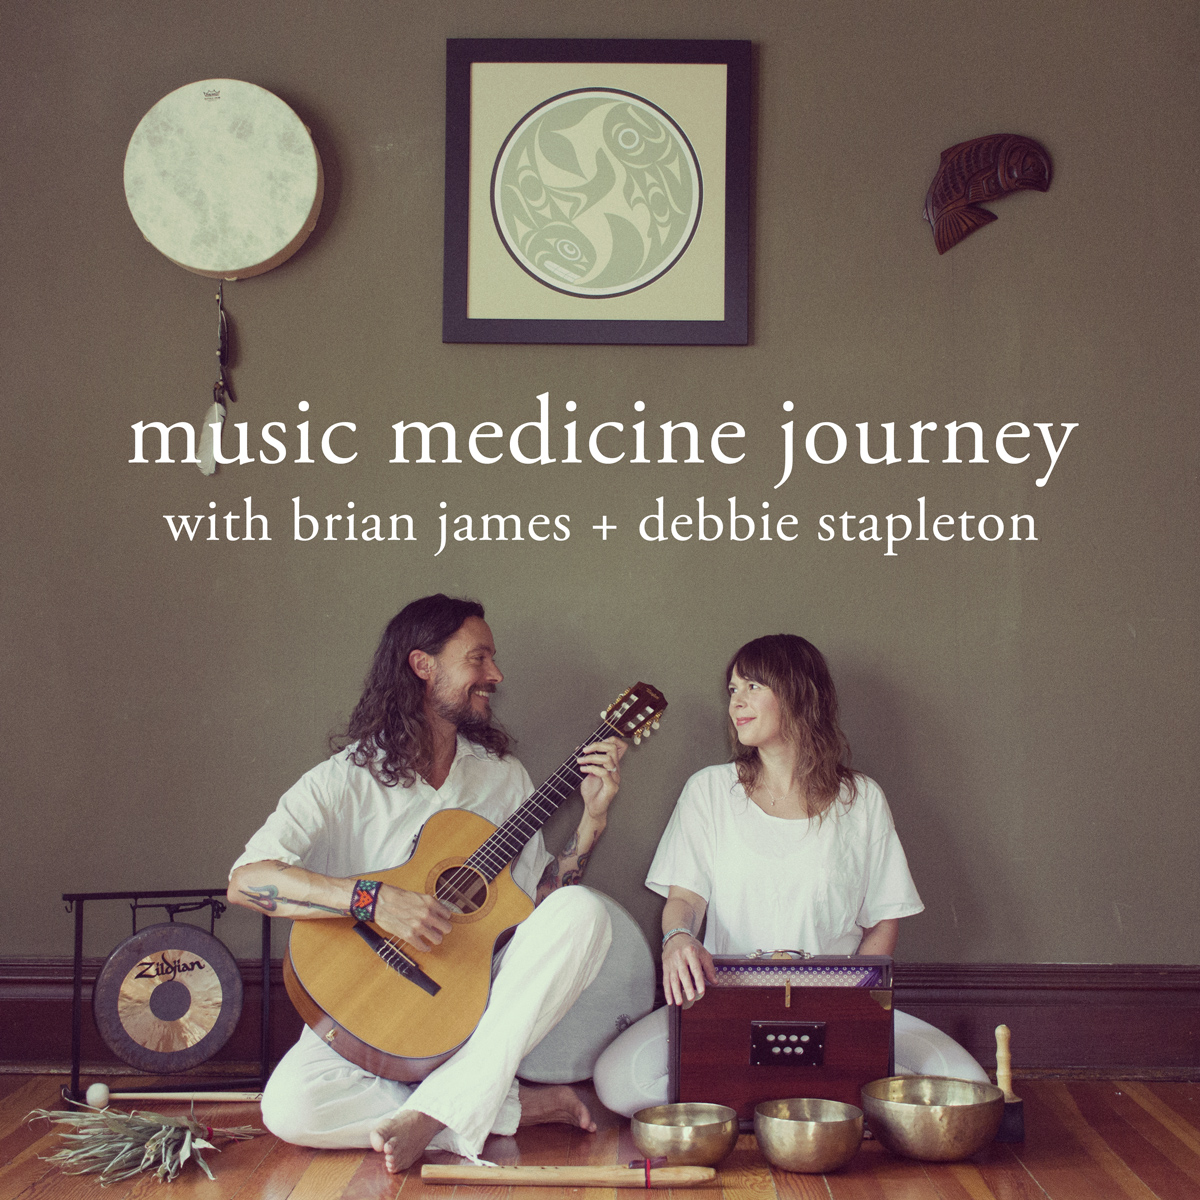 musicmedicine_promo.jpg